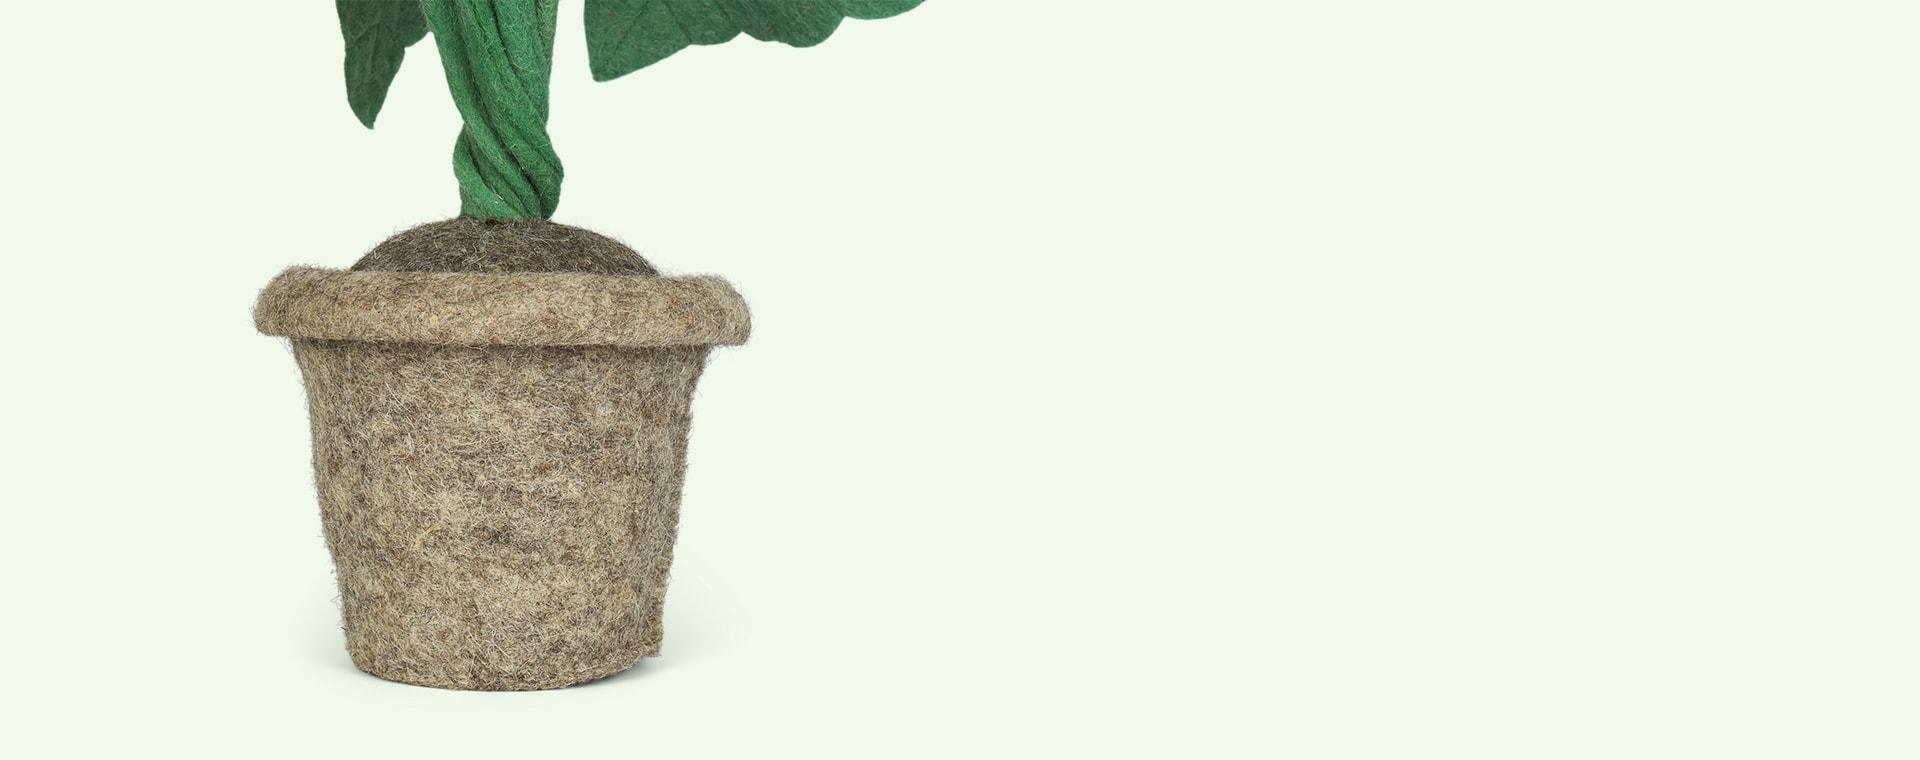 Green Kids Depot Alocasia Plant